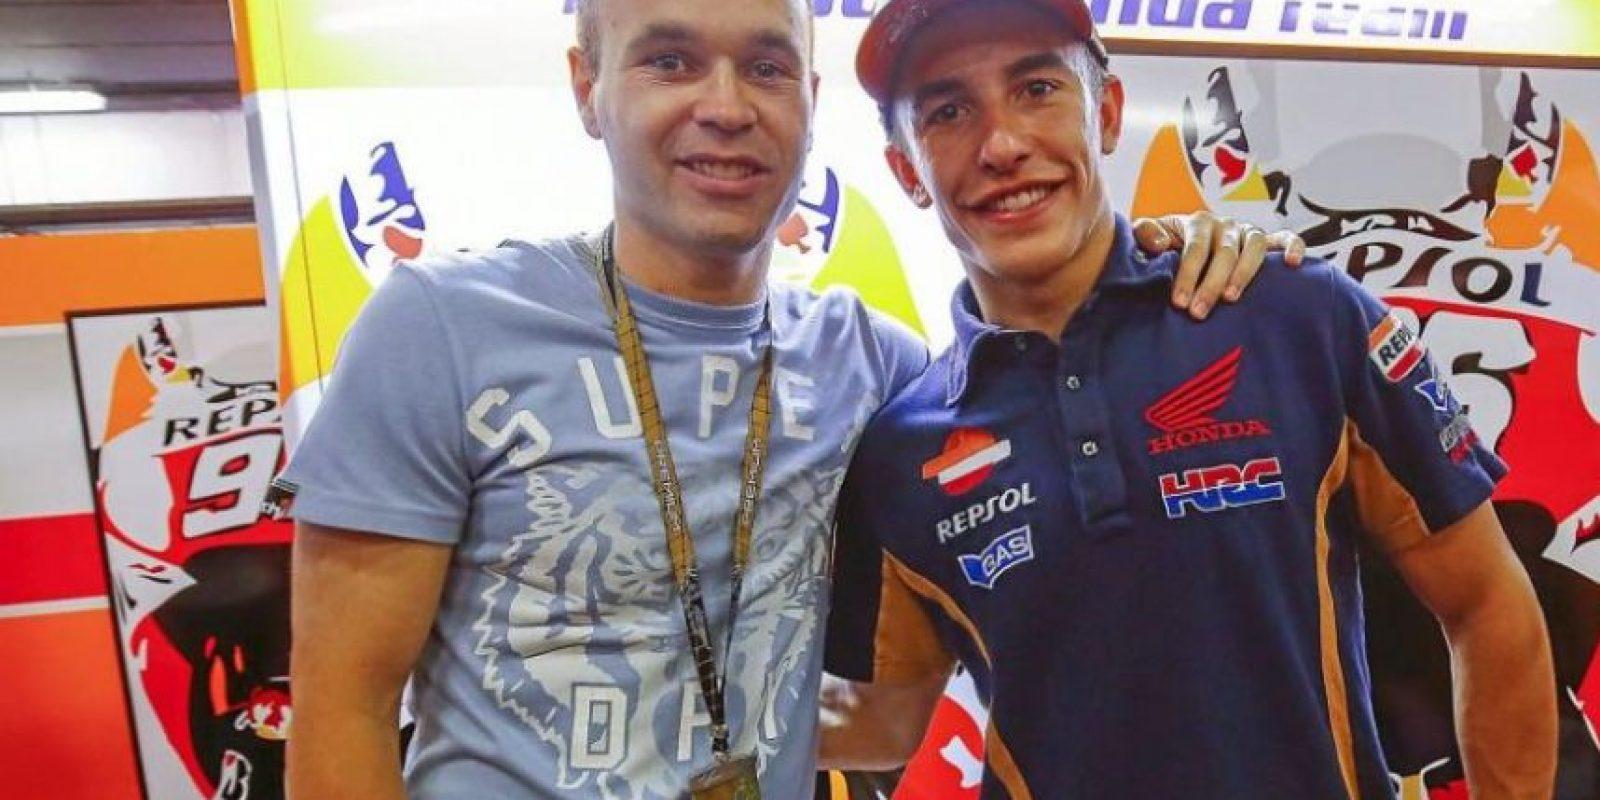 Andrés Iniesta y el piloto Marc Márquez Foto:Via instagram.com/marcmarquez93